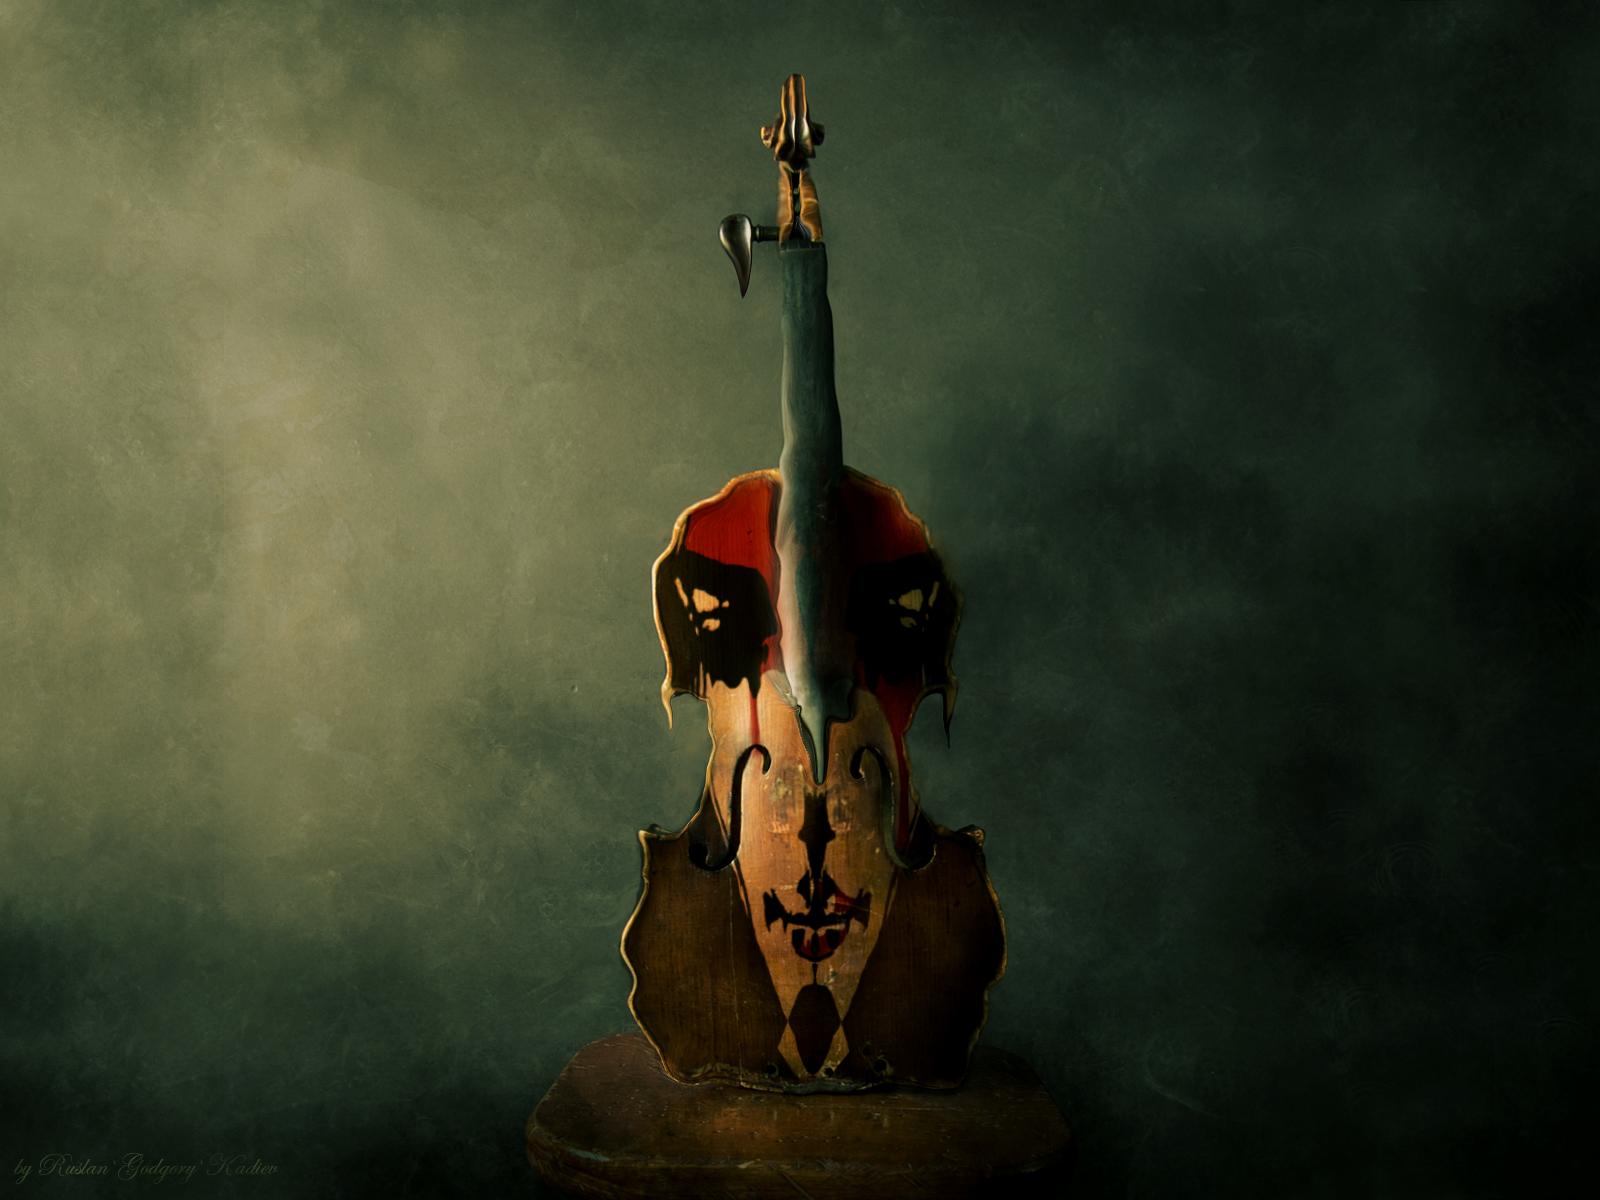 Soul Of Violin by RuslanKadiev